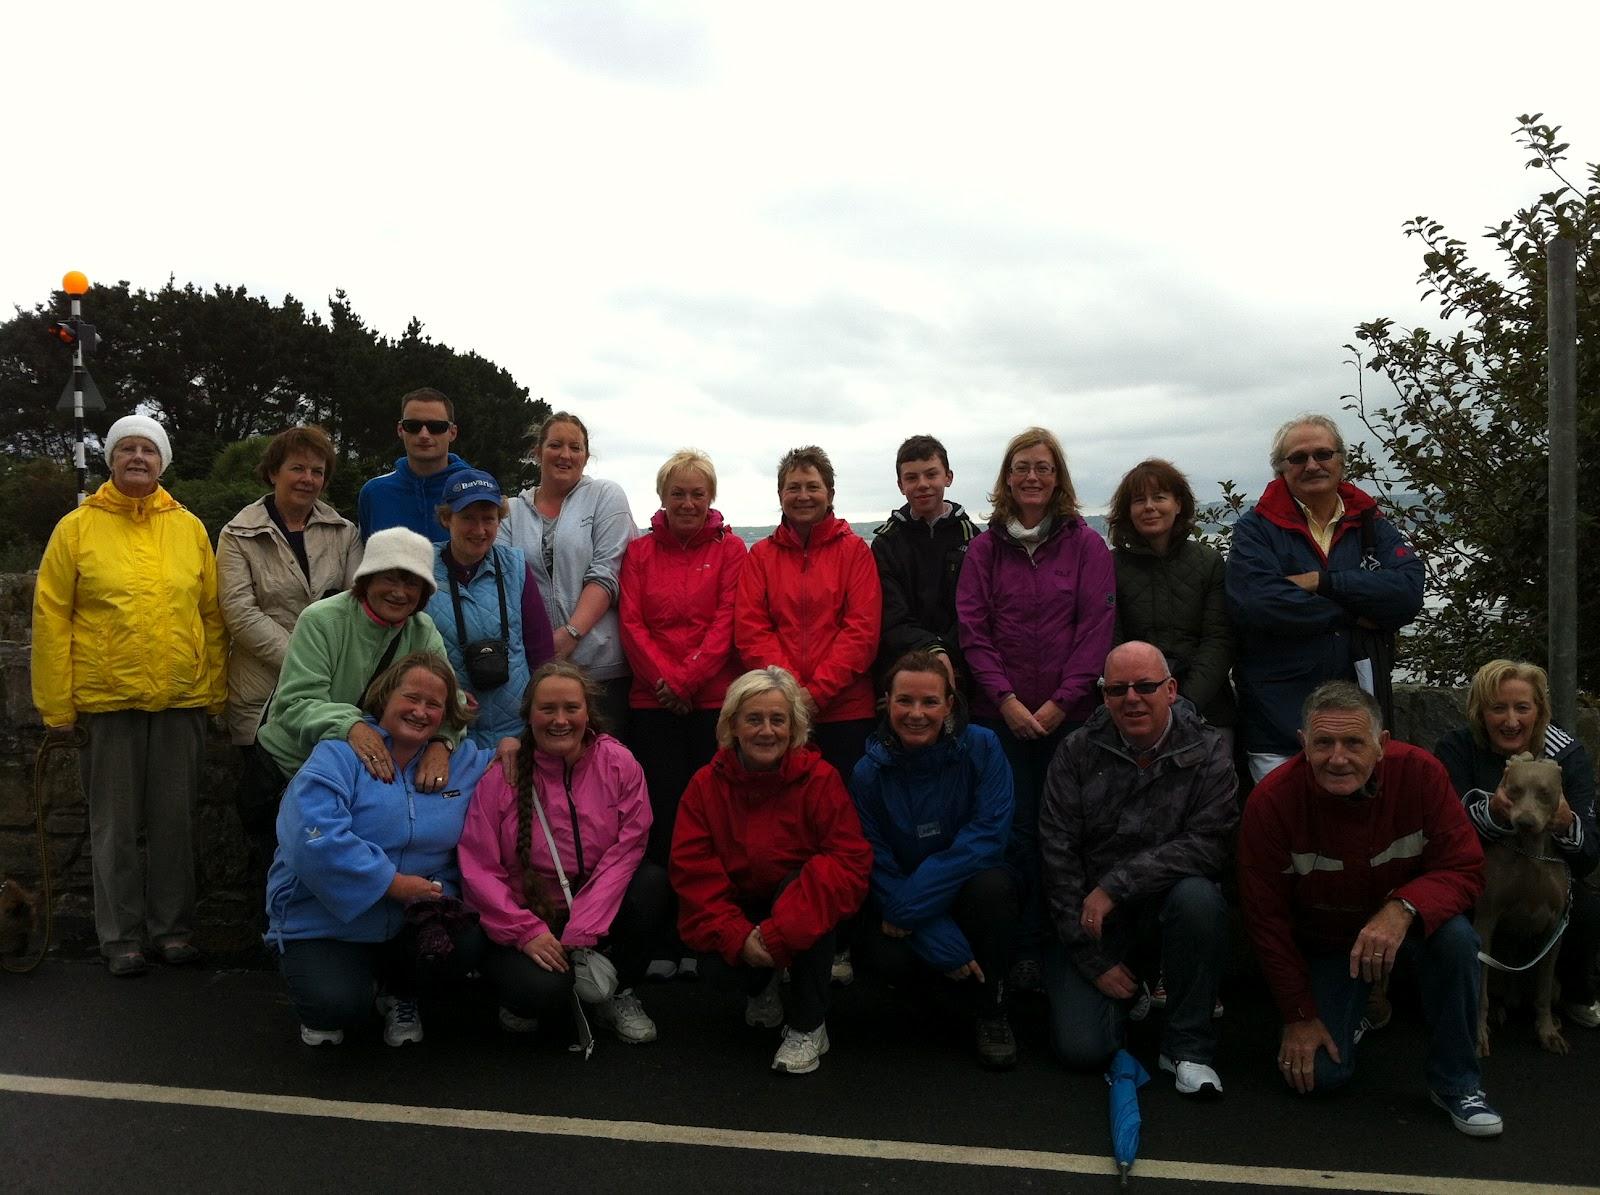 waterford sports partnership dungarvan railway walk